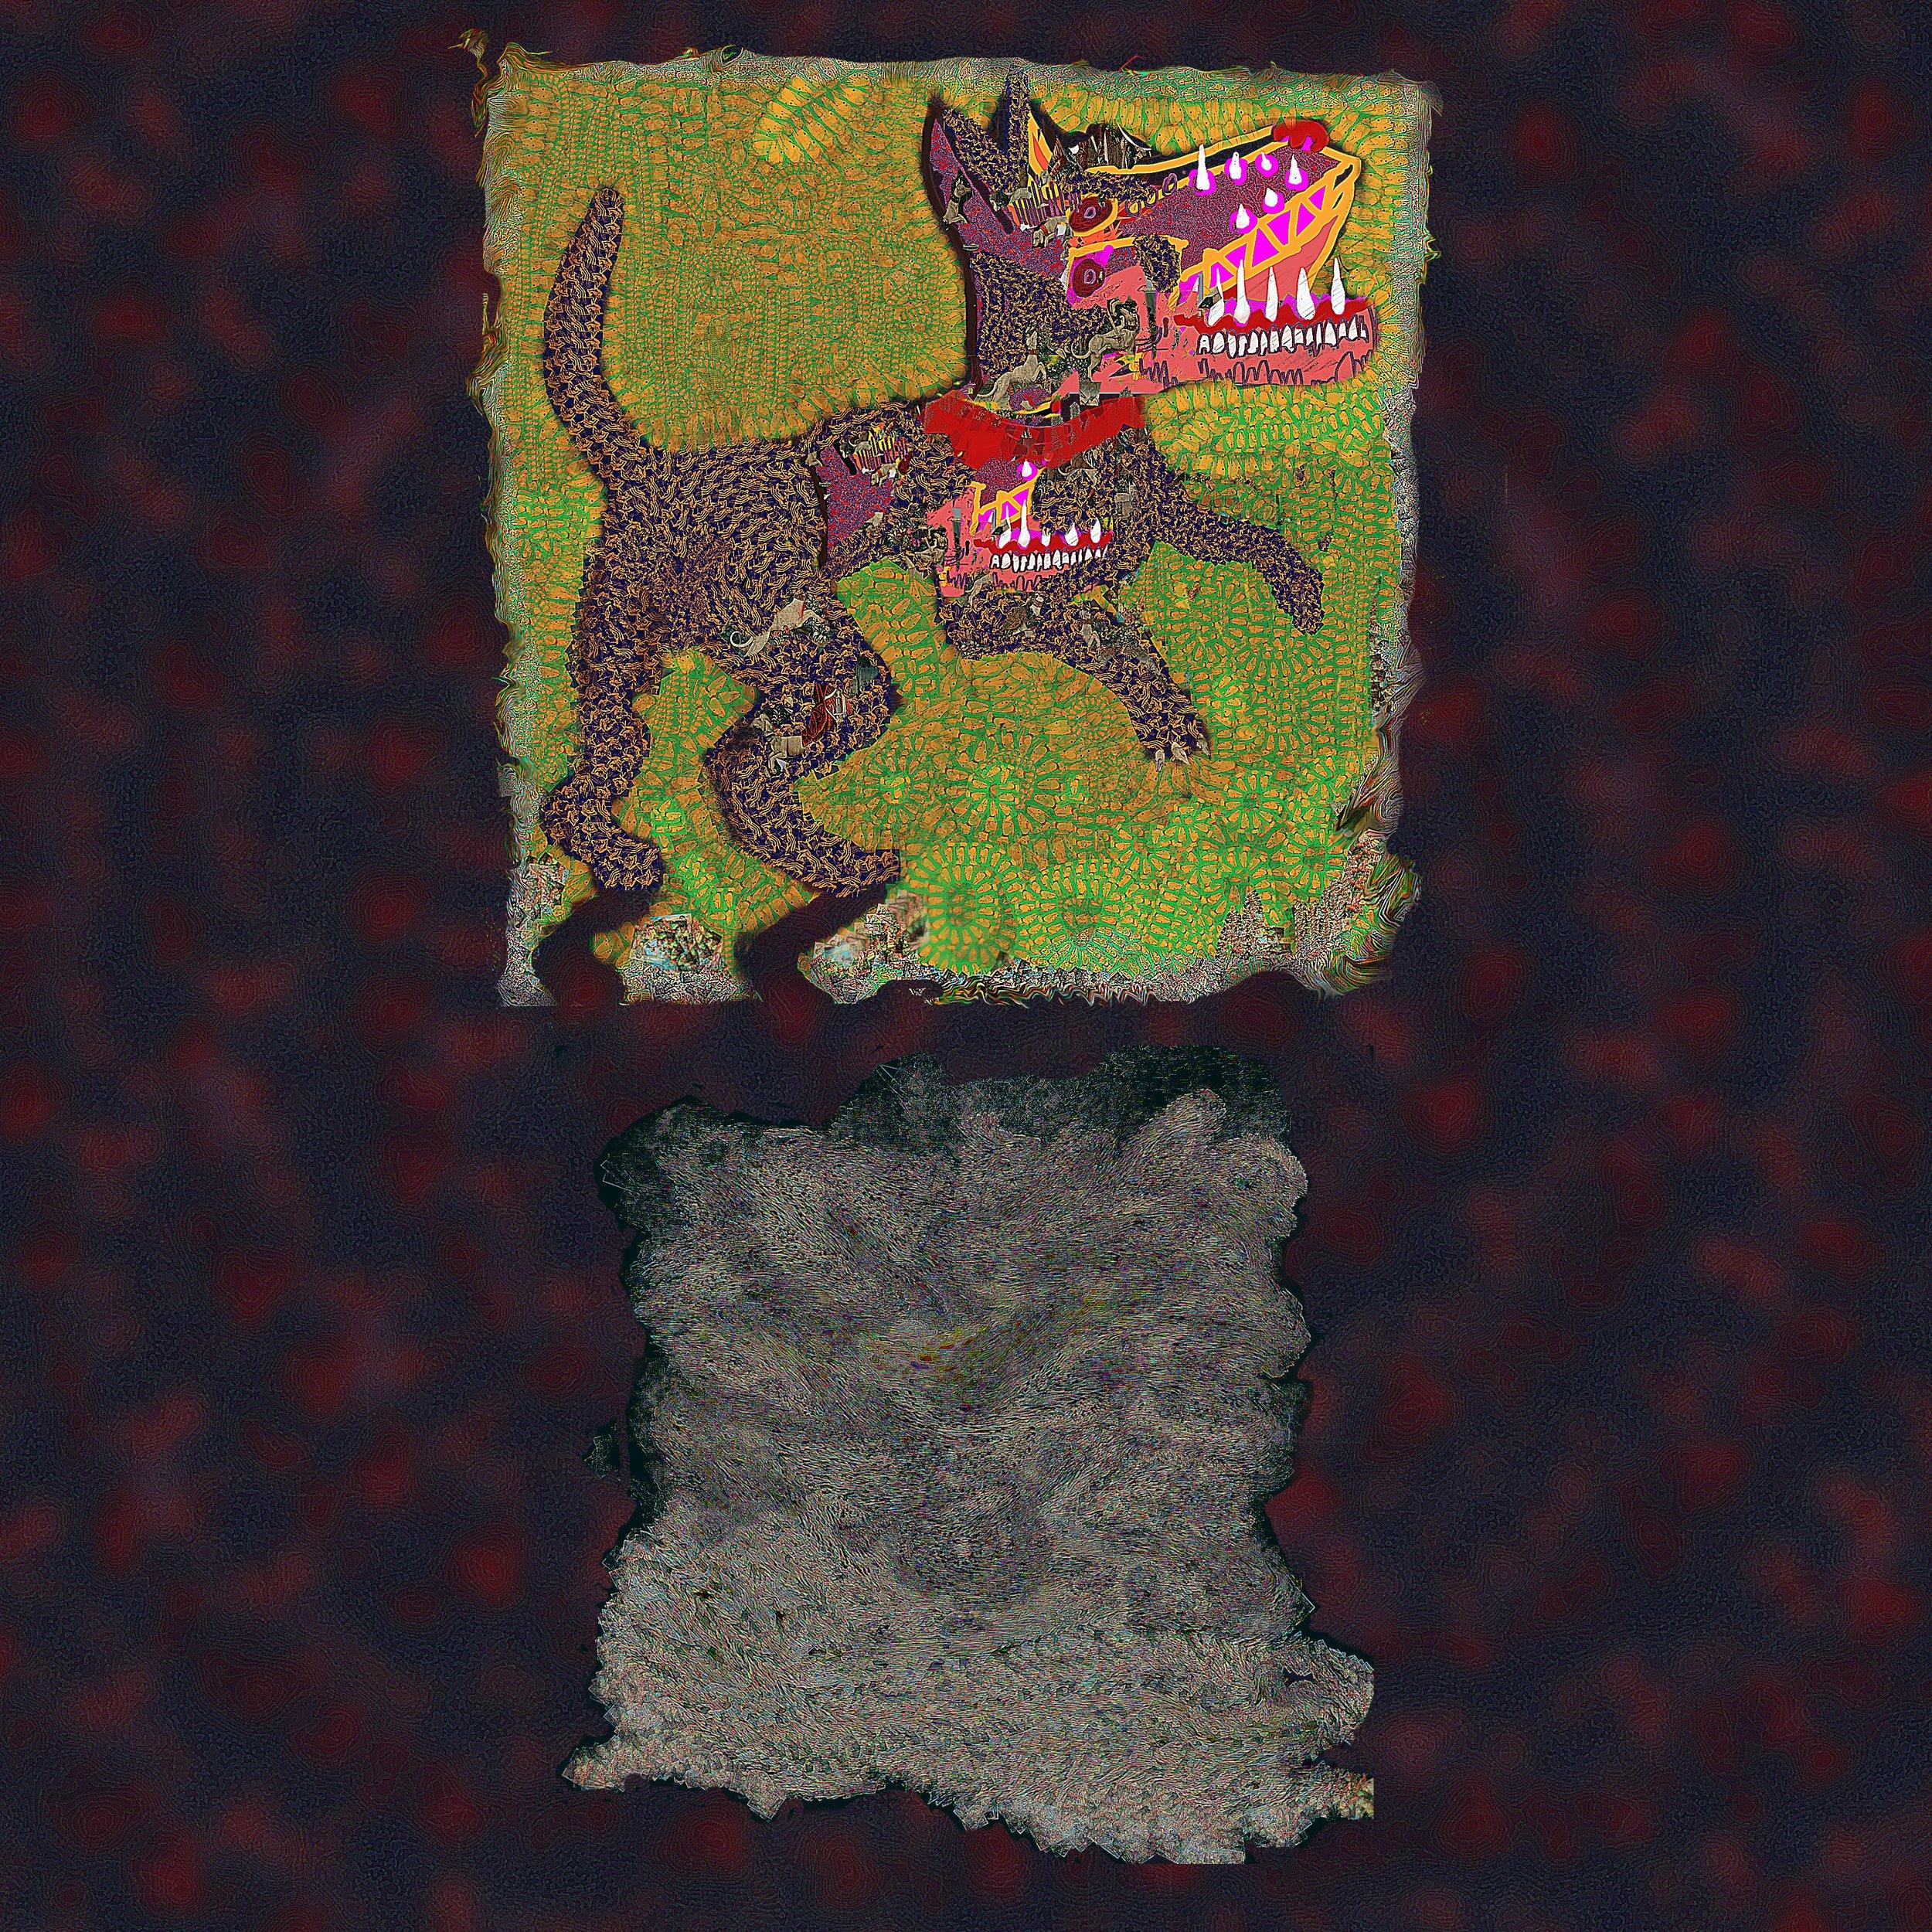 Black montain doge160.jpg